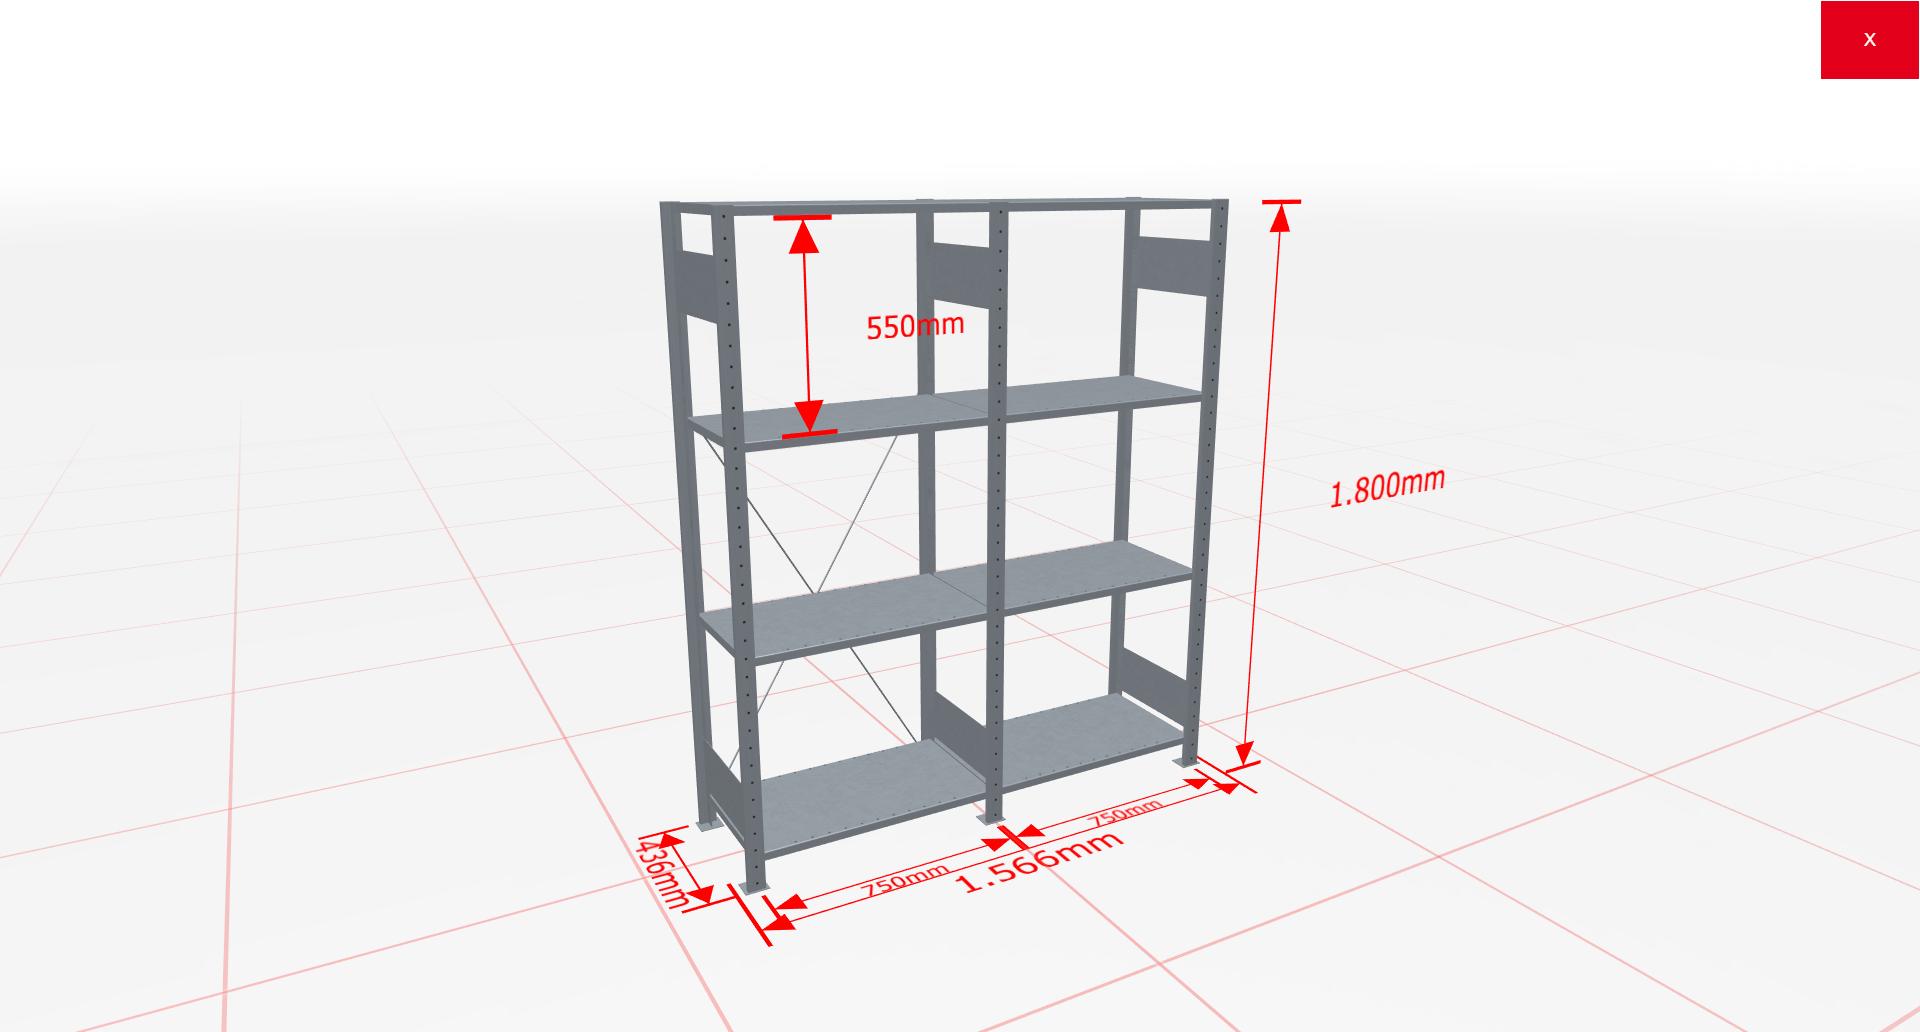 Fachbodenregal Komplettregal 1800x1566x400 mm (HxBxT) SCHULTE Lagertechnik verzinkt 4 Ebenen  150 kg je Boden